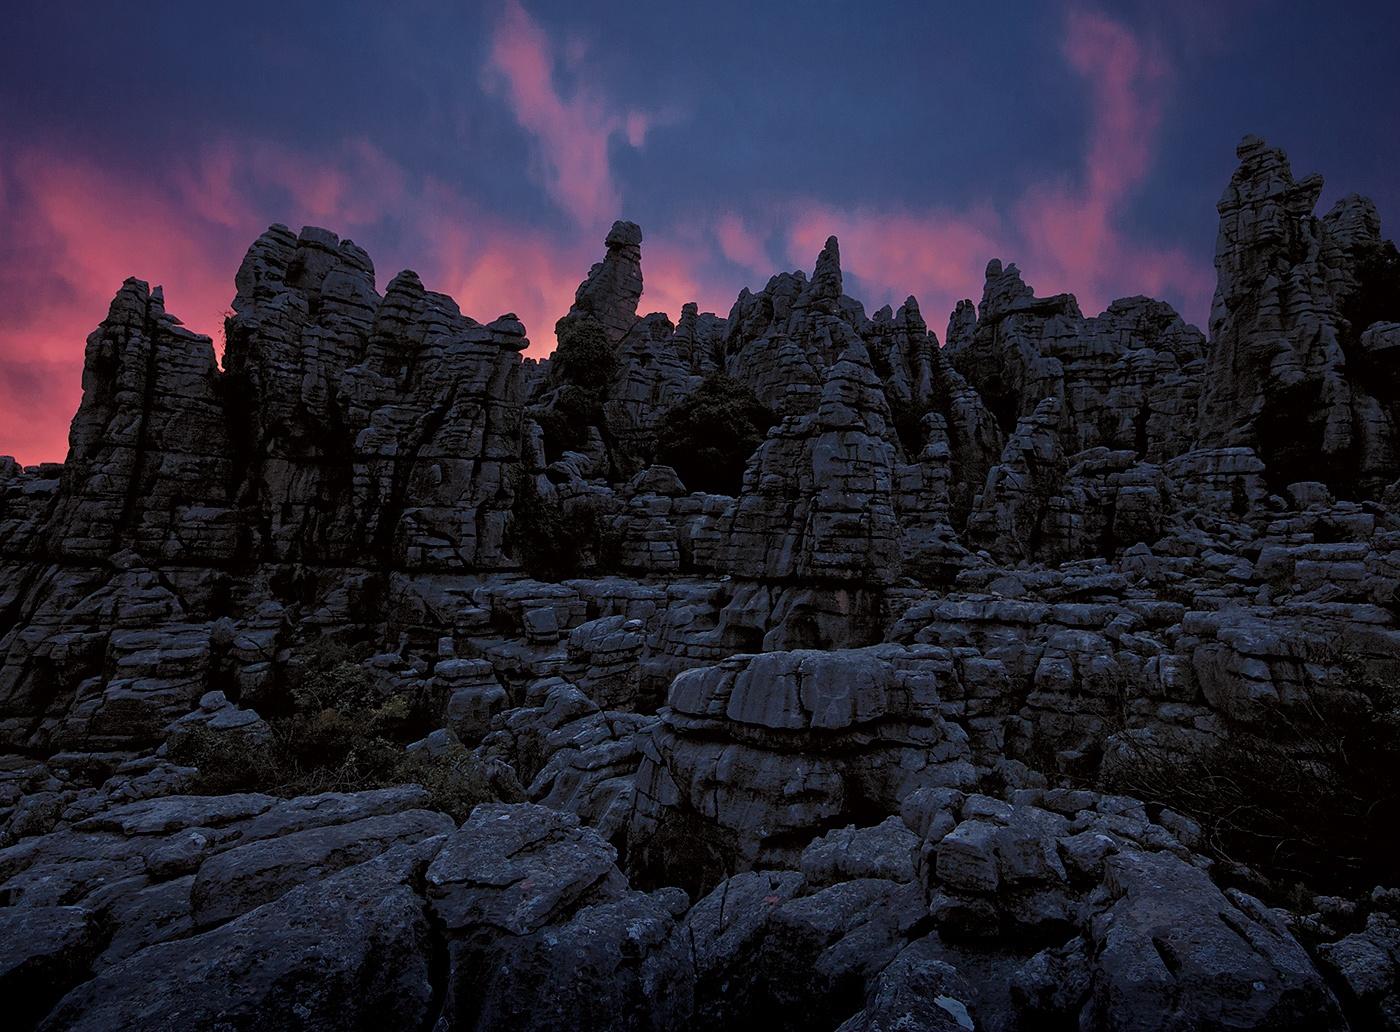 Valle Genal - Phantasmagoric - Peter Manschot Al Andalus Photo Tour, Landscape photography photos prints workshops Andalusia Spain